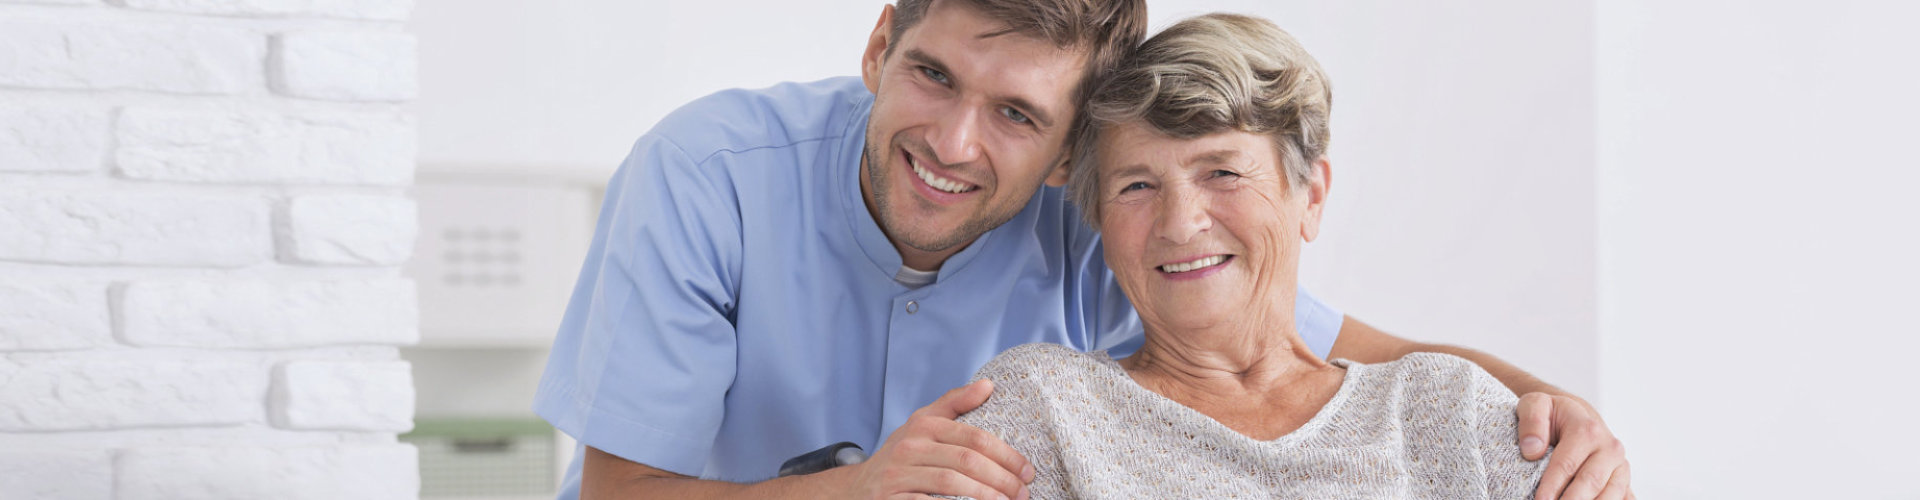 caregiver hugging senior woman with dementia